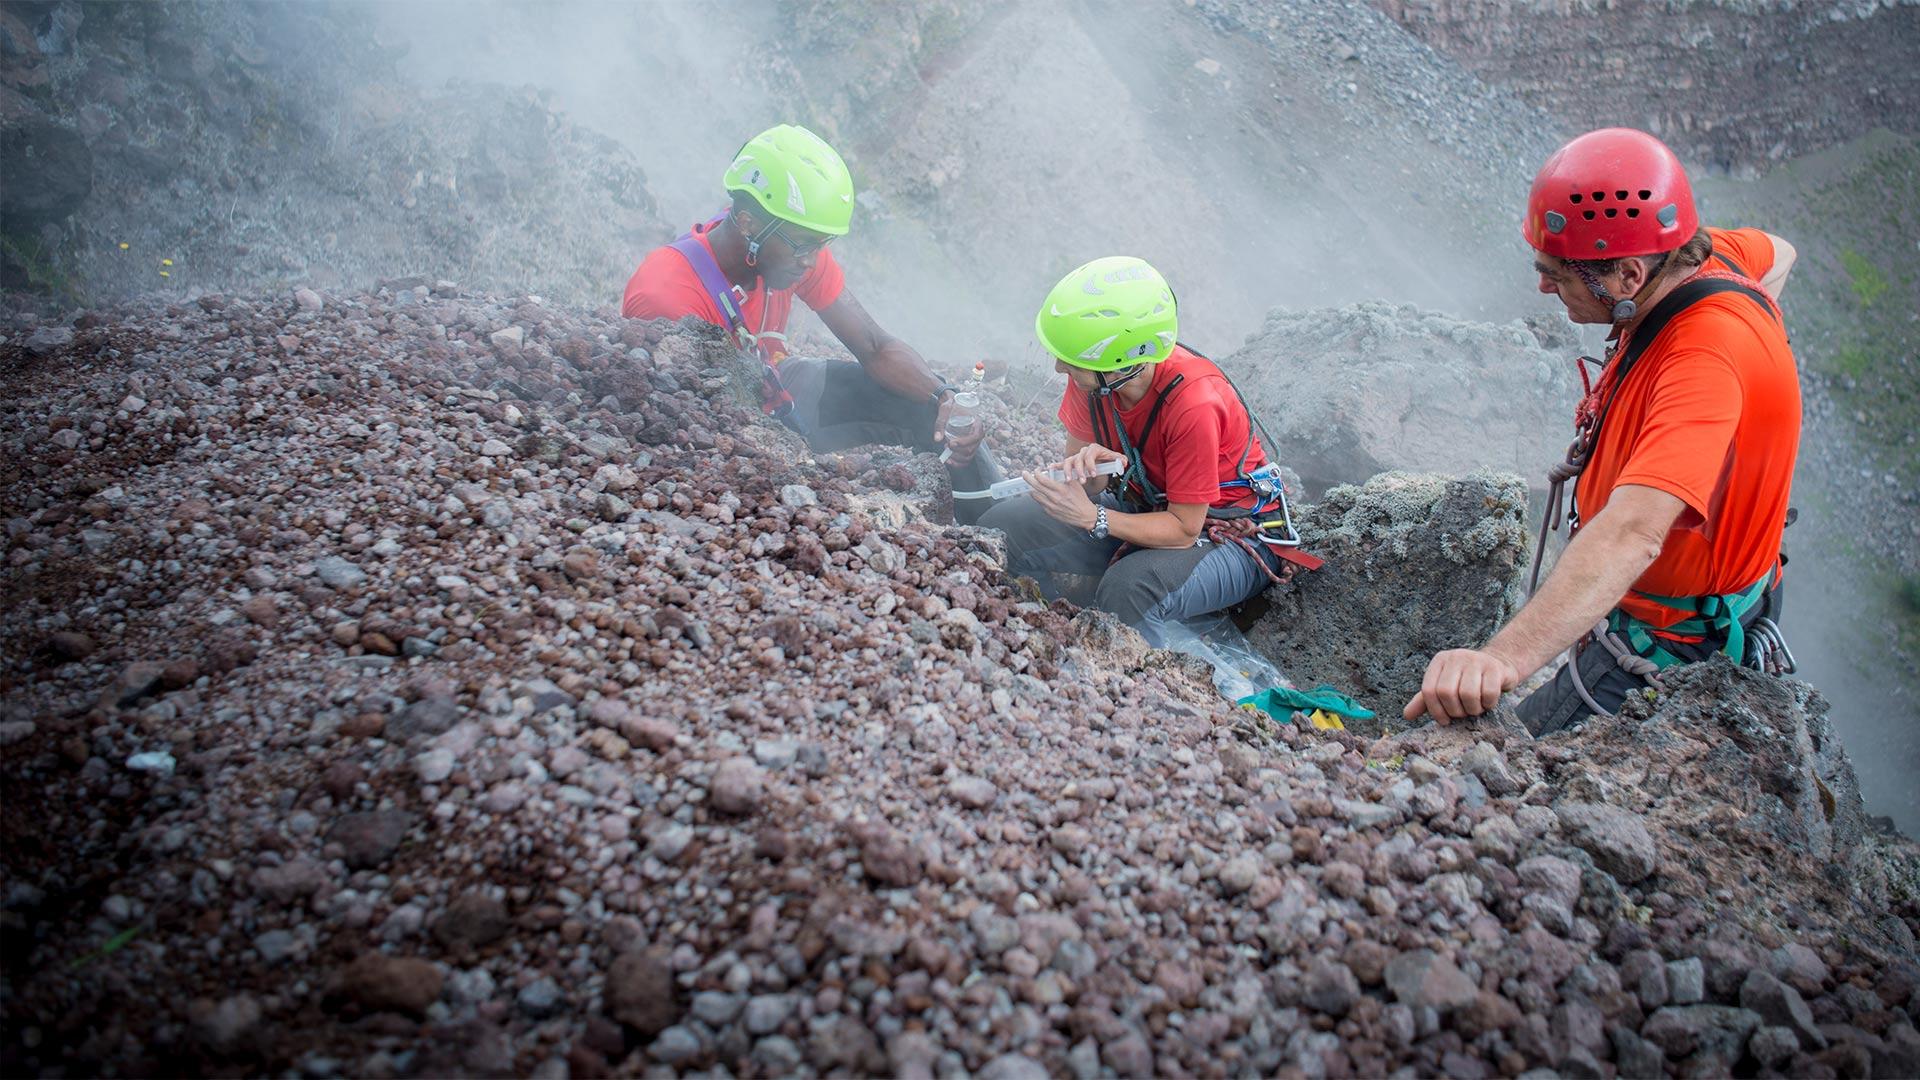 Chris Jackson, Rosanna D'Arienzo and Berardino Bocchino collecting gases from Vesuvius crater.